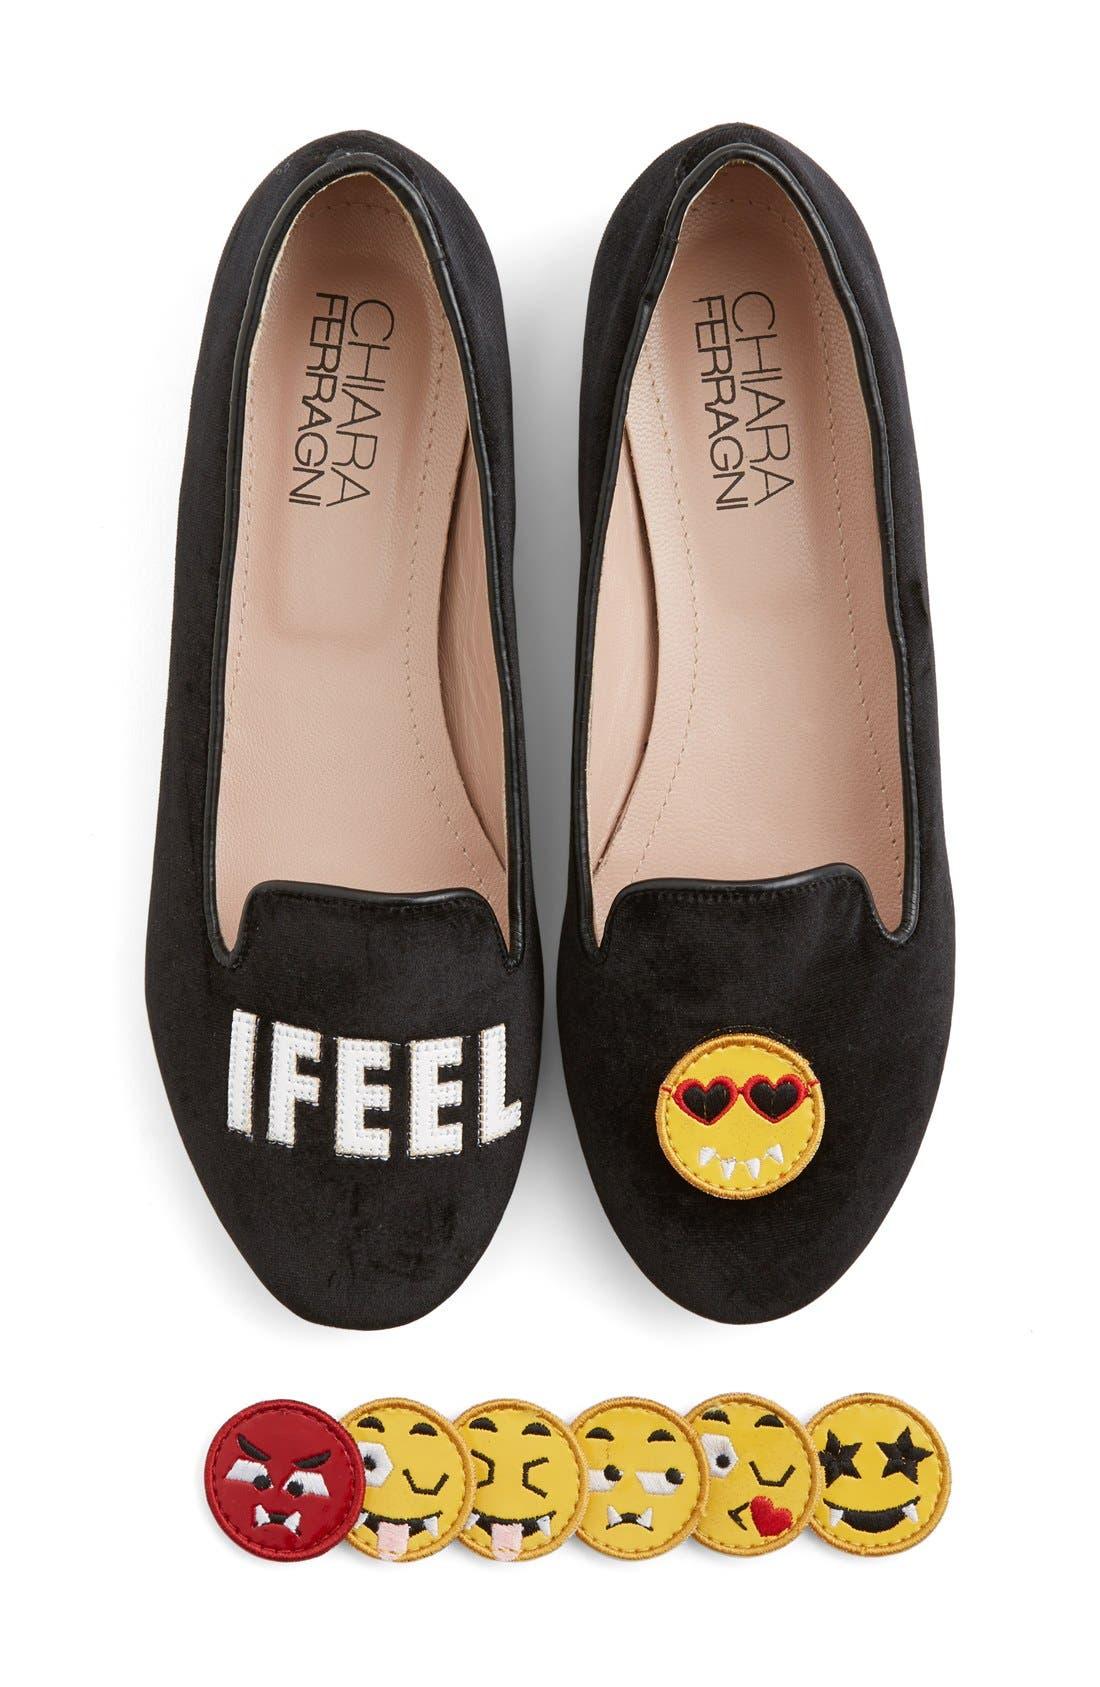 Main Image - ChiaraFerragni'I Feel' Flat (Women)